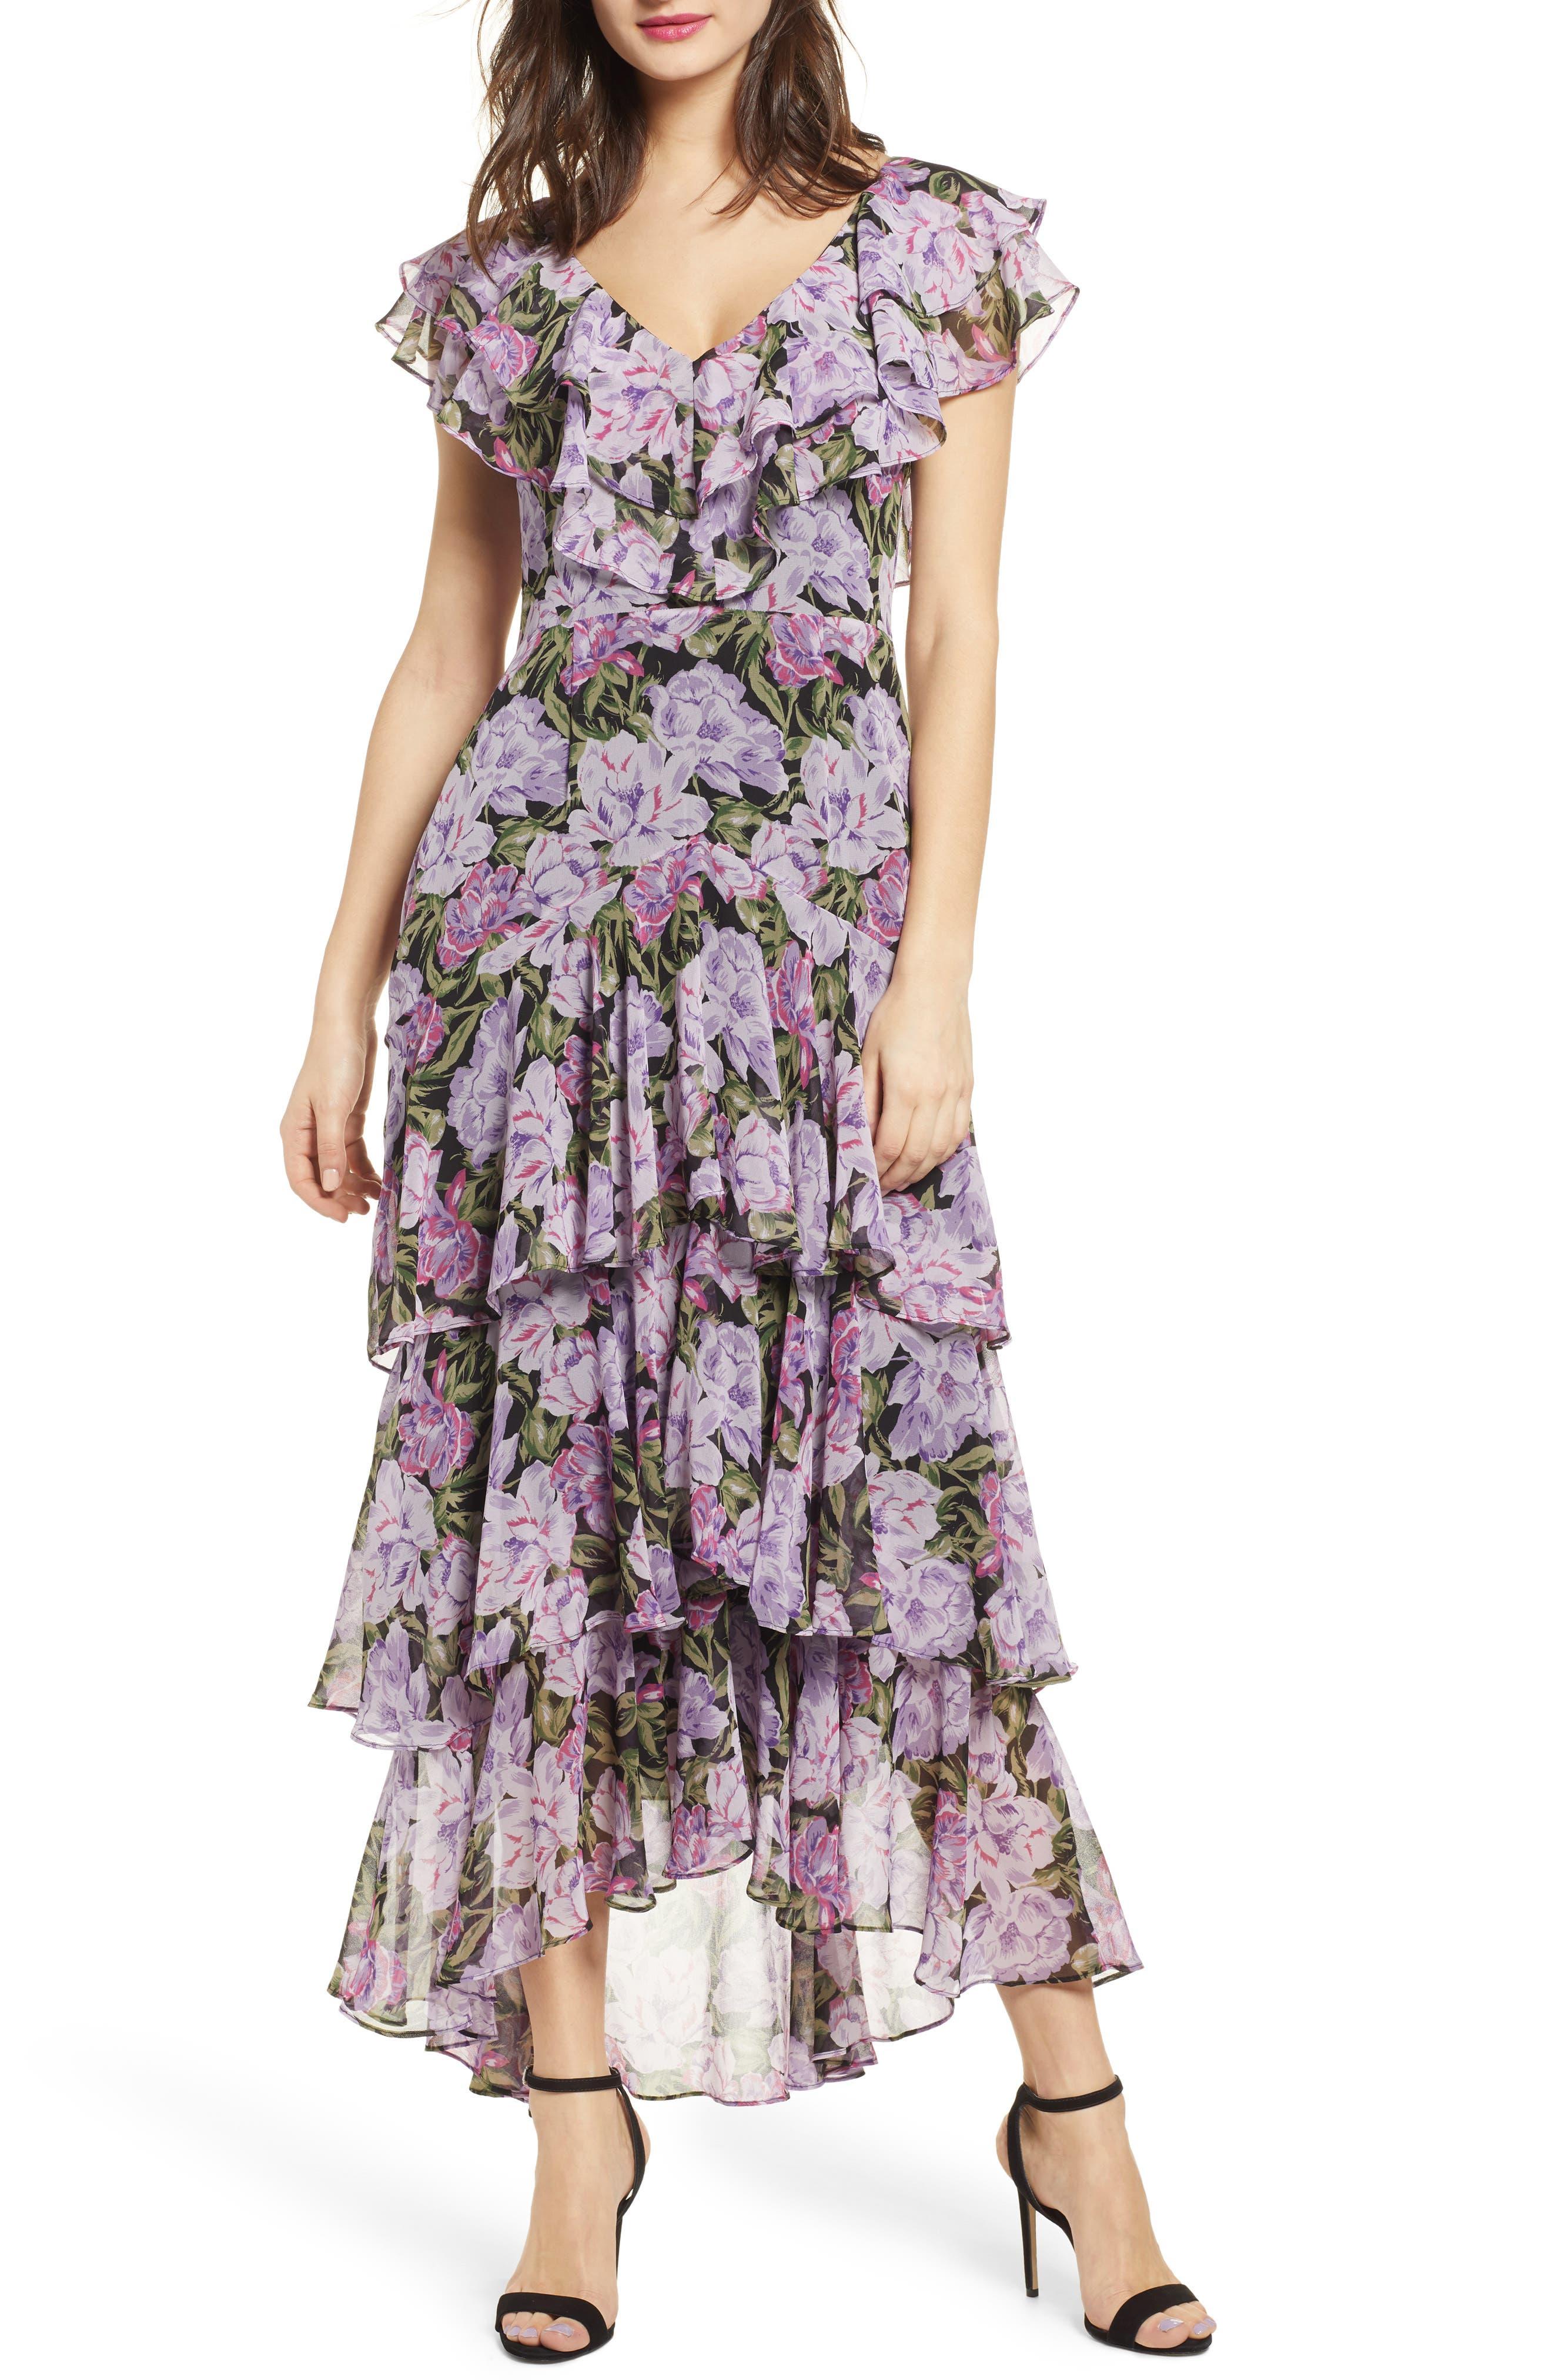 Dresses 2018 Kids Baby Girl Sleeveless Stripe Long Maxi Dress Holiday Party Weddding Dress 1-6t Hot Aromatic Flavor